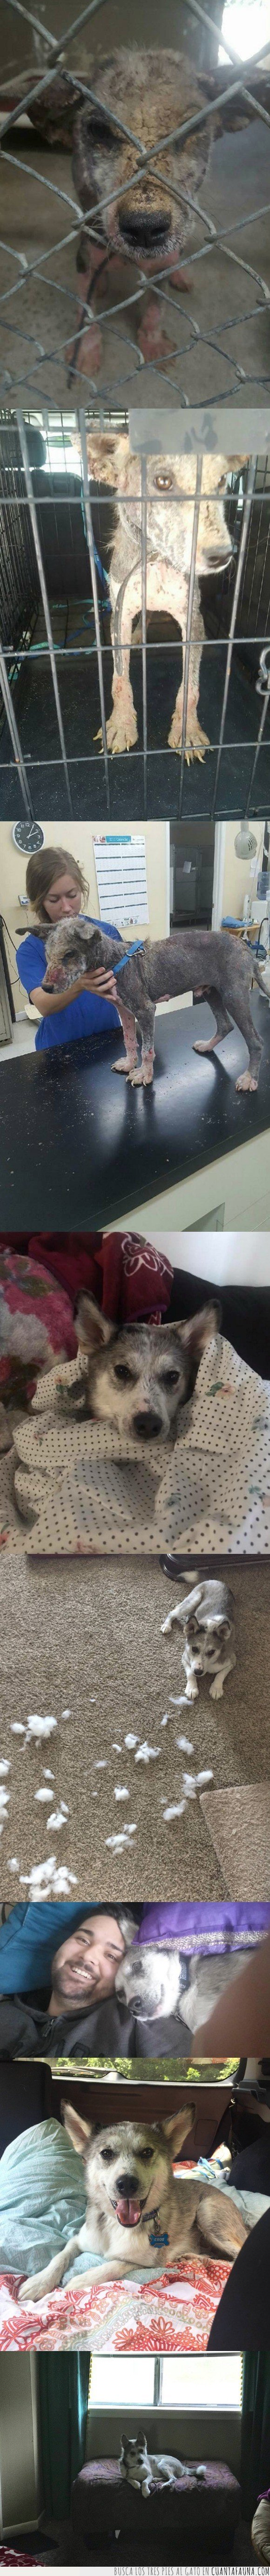 abandono,adopta,perro,sarna